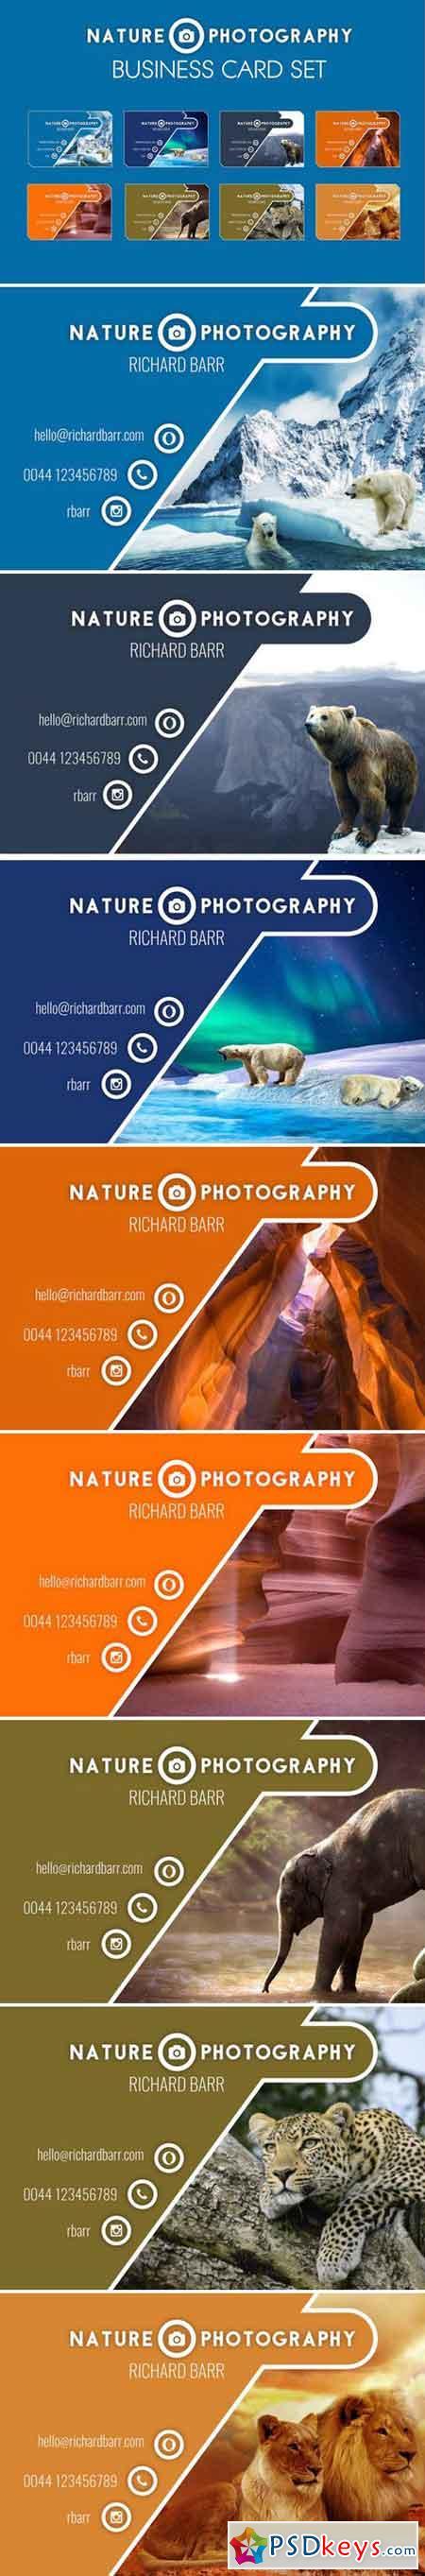 Nature Photography Business Card Set 2204748